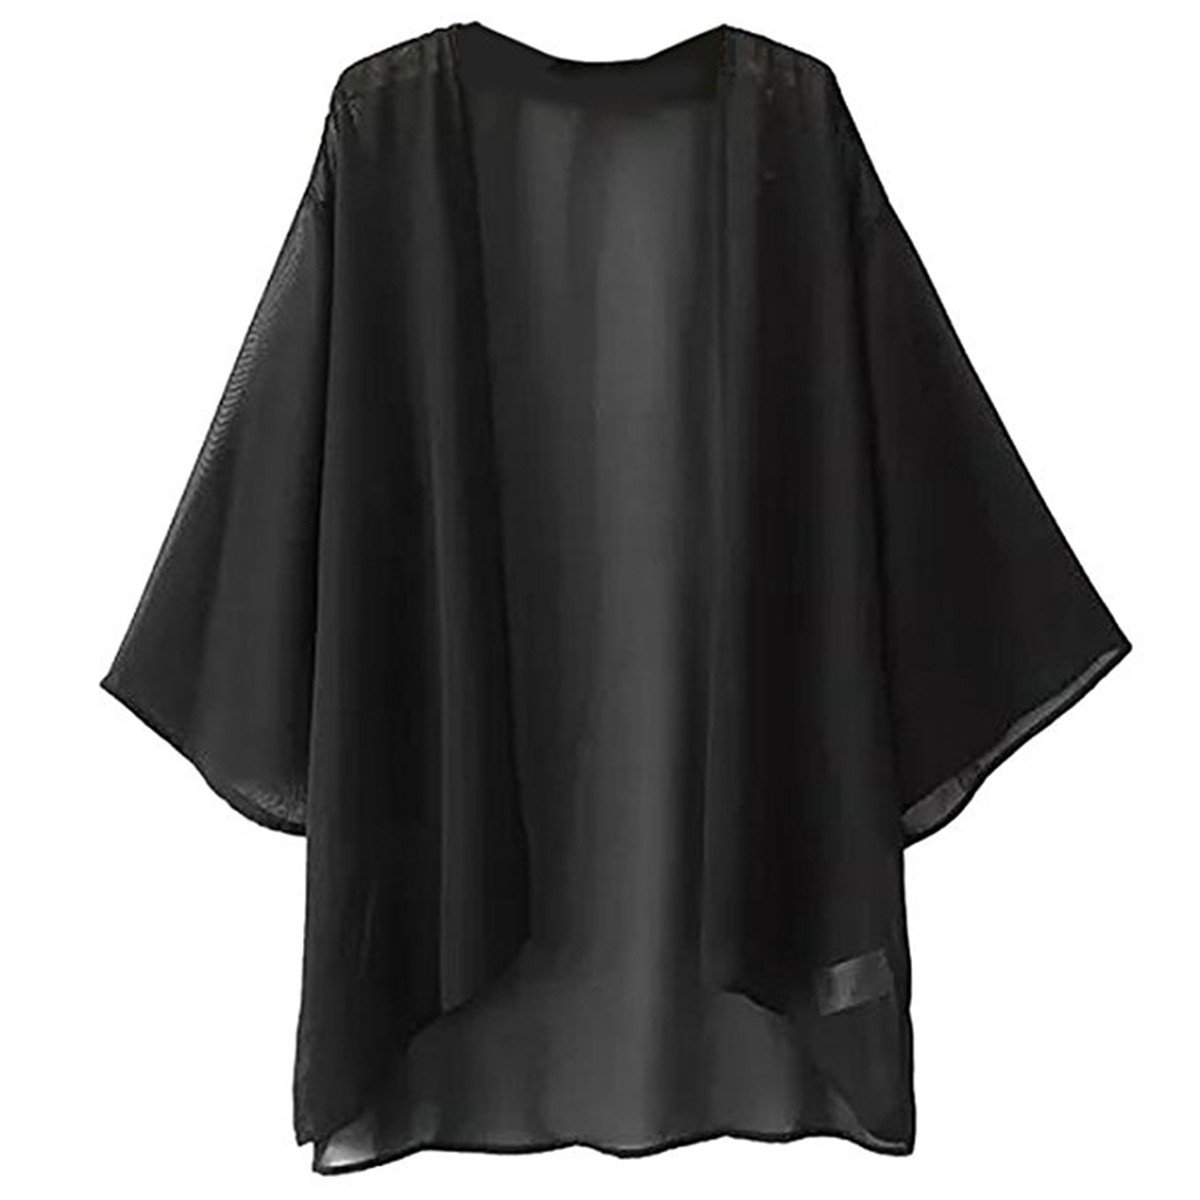 Hsumonre Women's Solid Loose Chiffon Sheer Cardigan Kimono Cover Ups Black